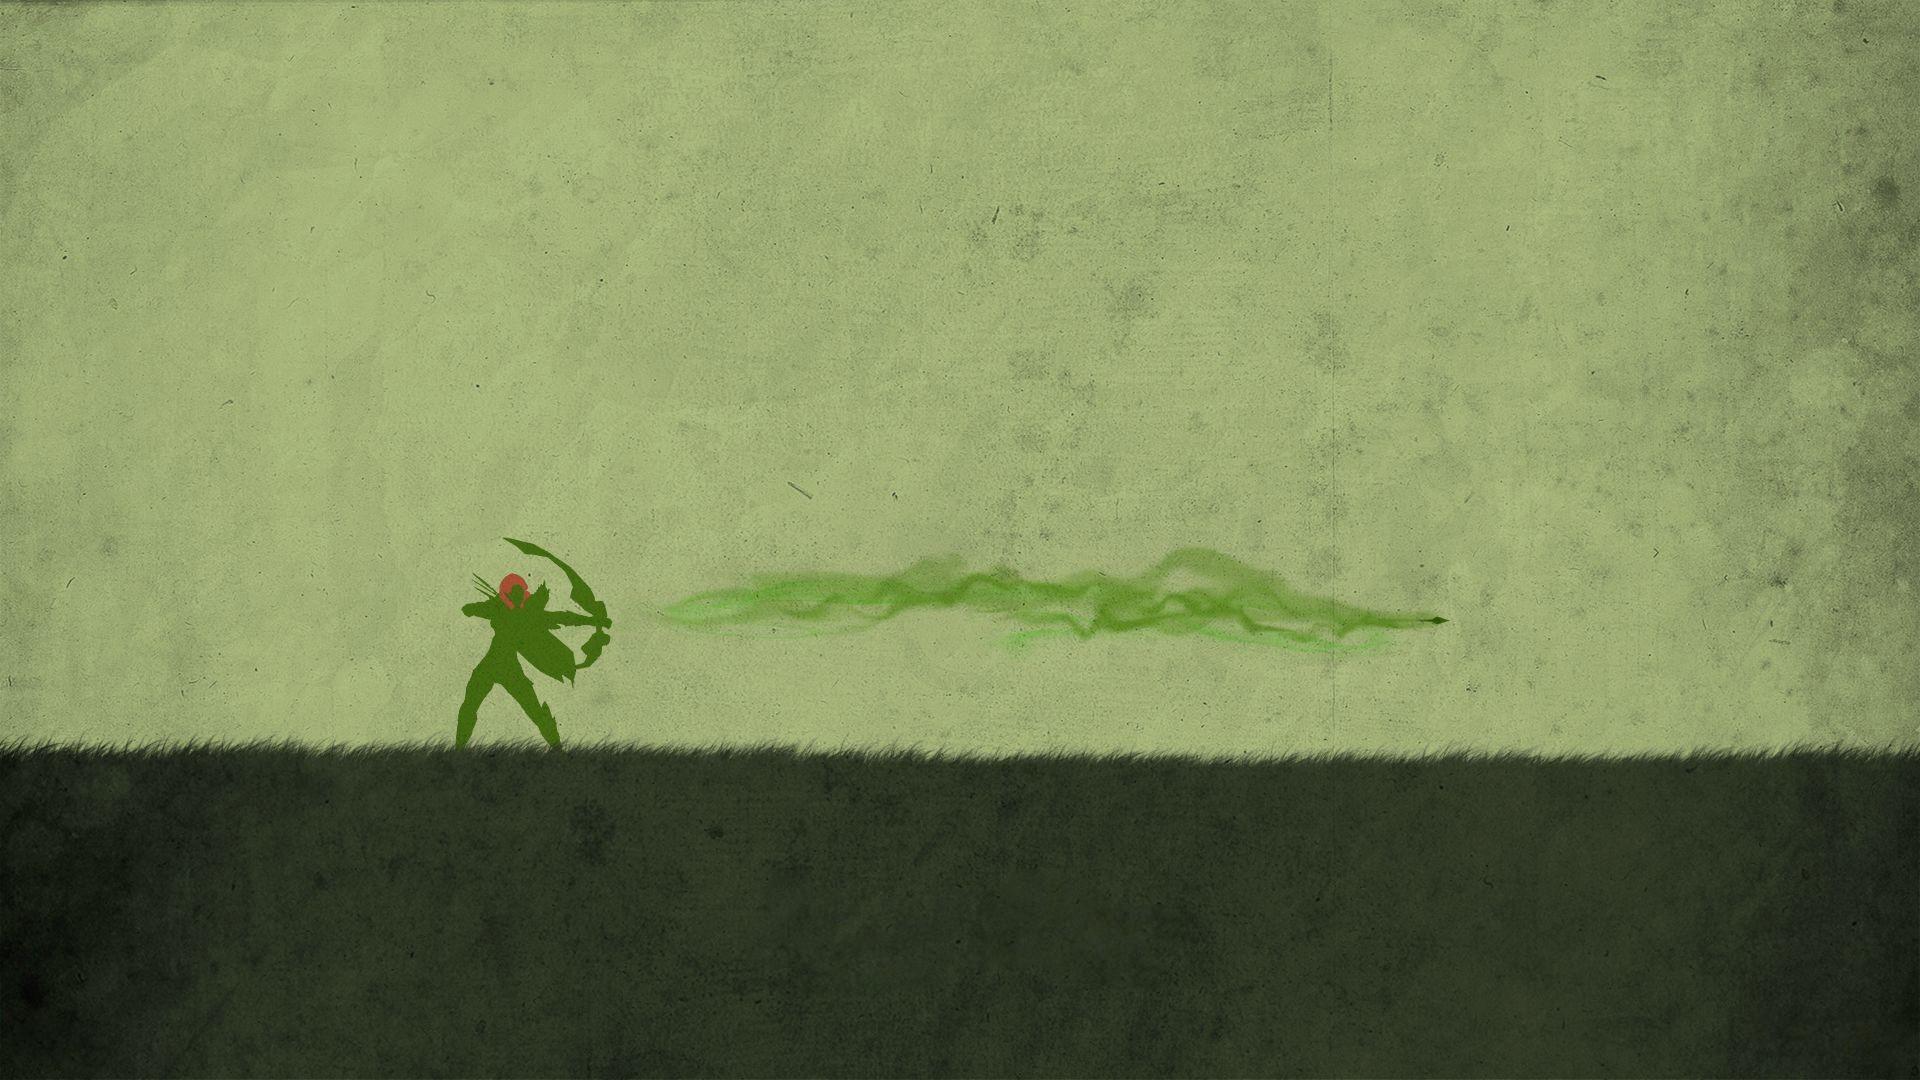 Cute Simple Beach Wallpaper Video Games Dota 2 Fighting Online Simple Background